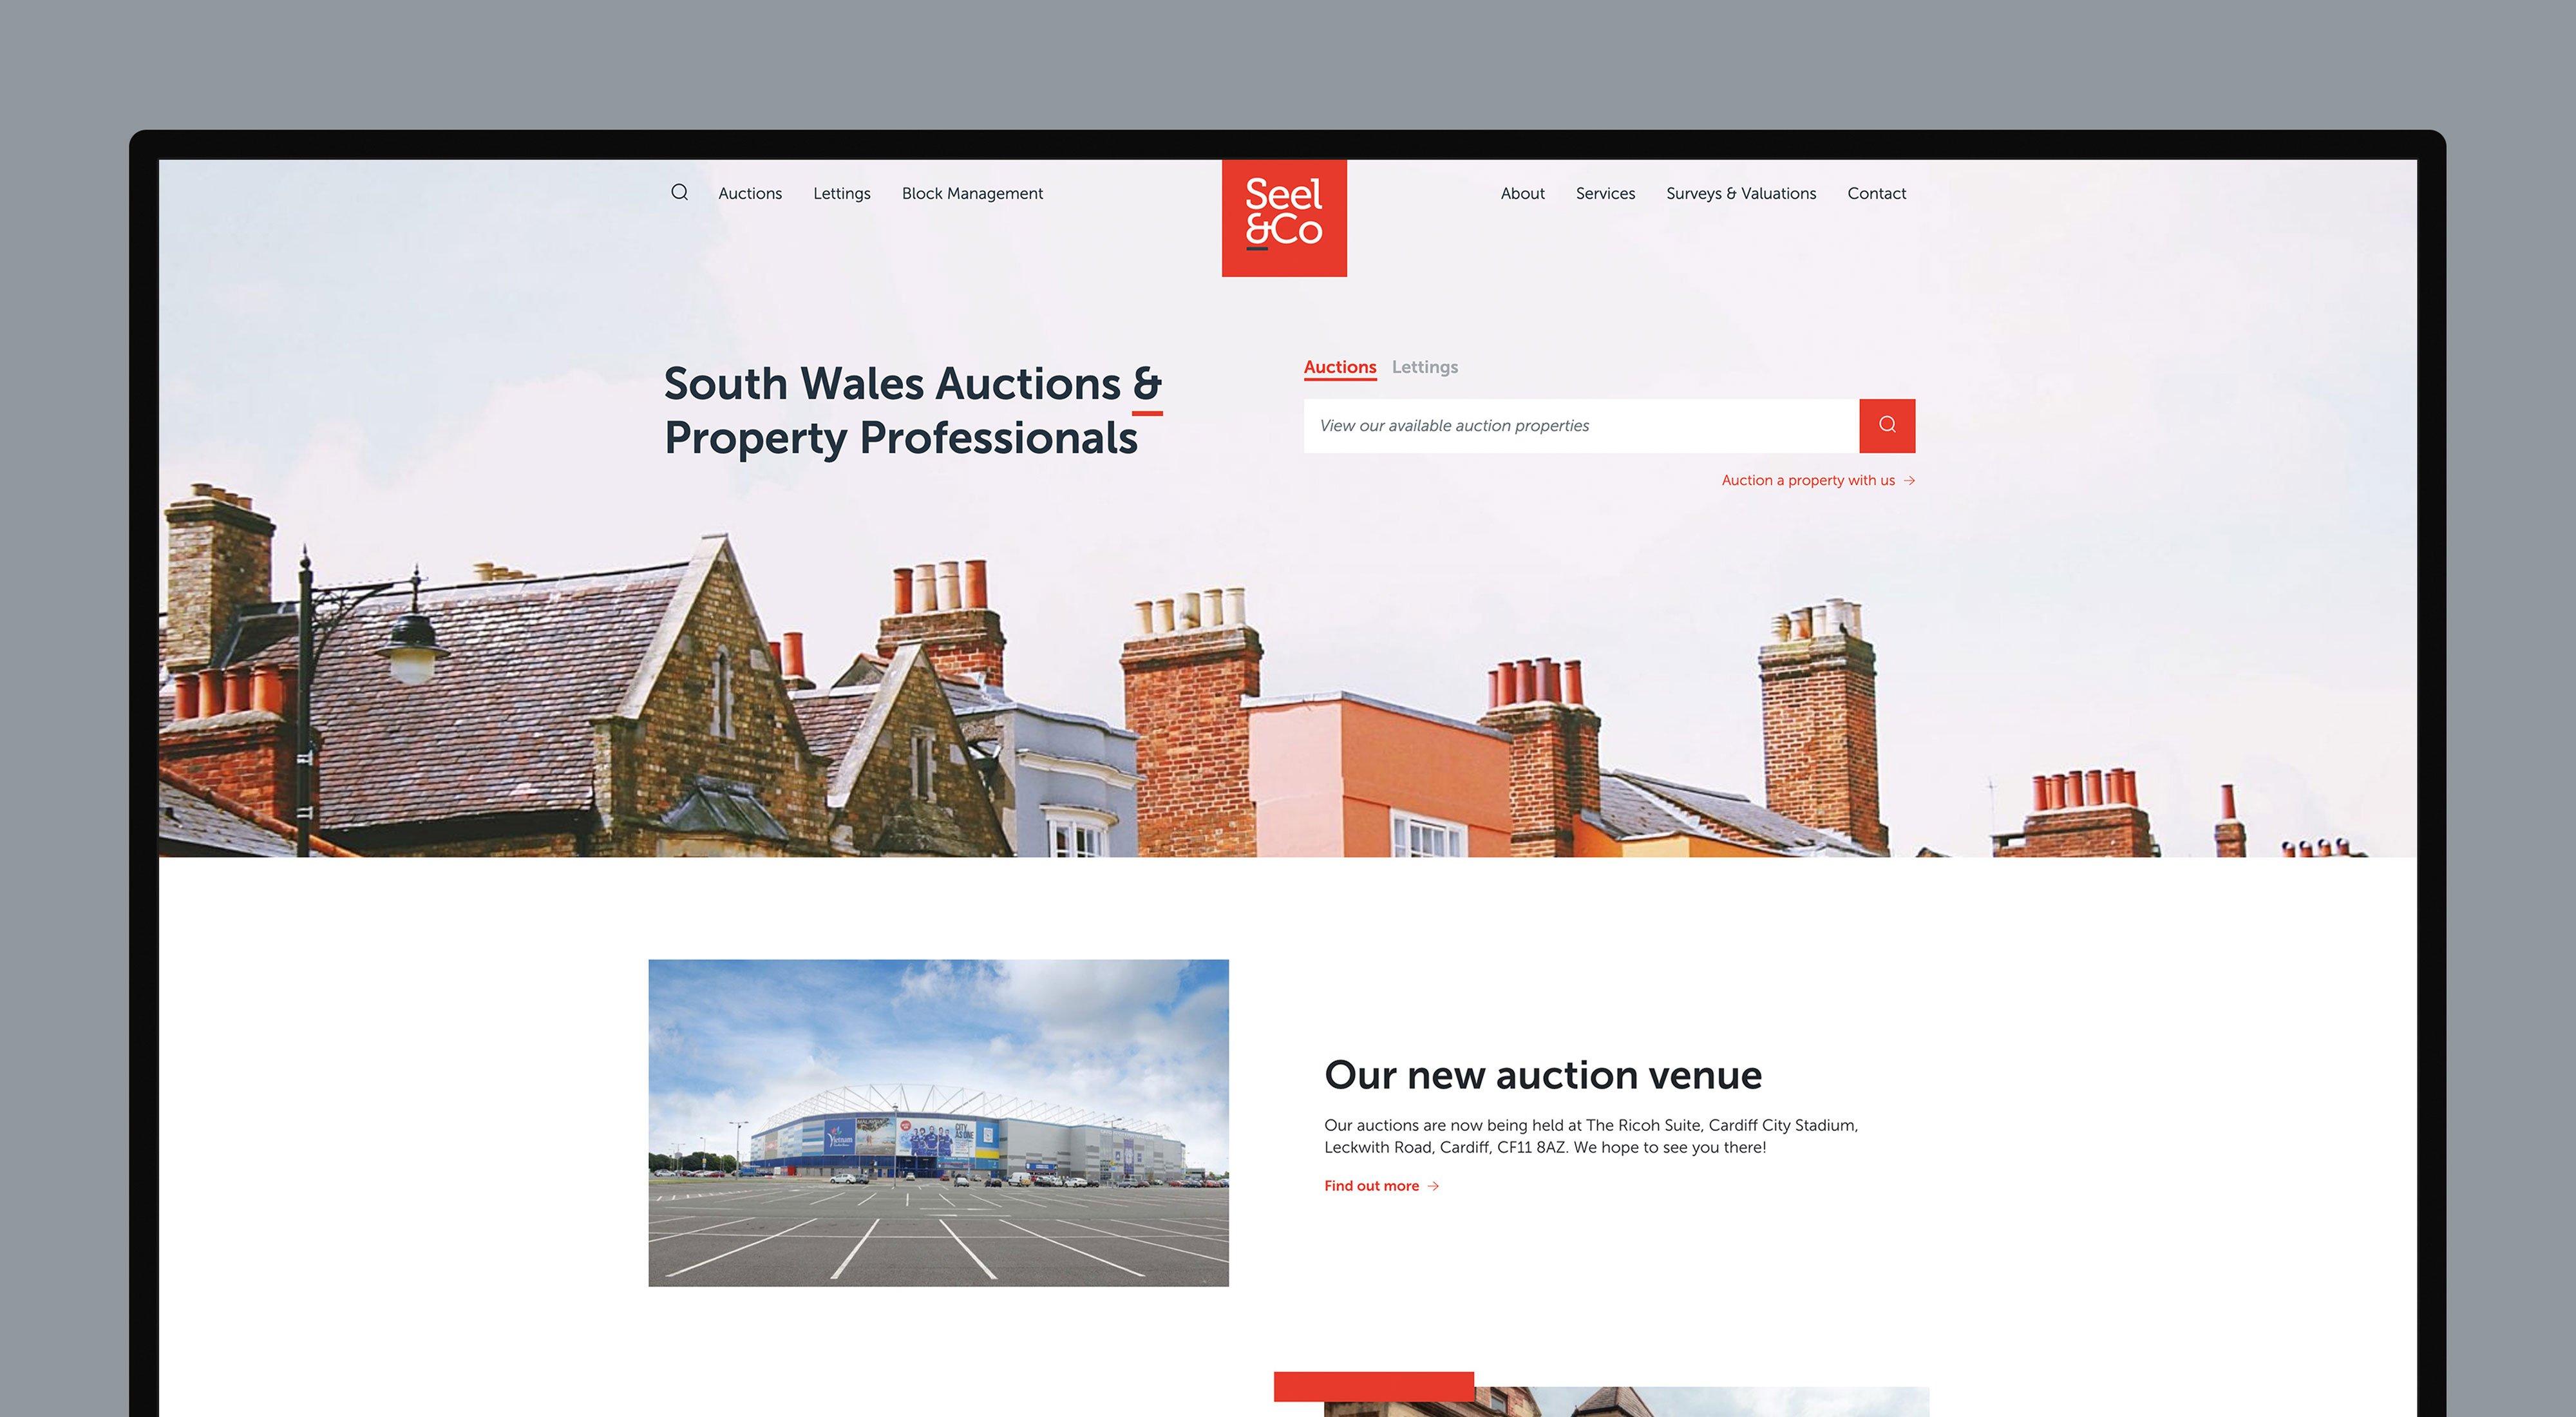 Seel & Co Website Design Cardiff